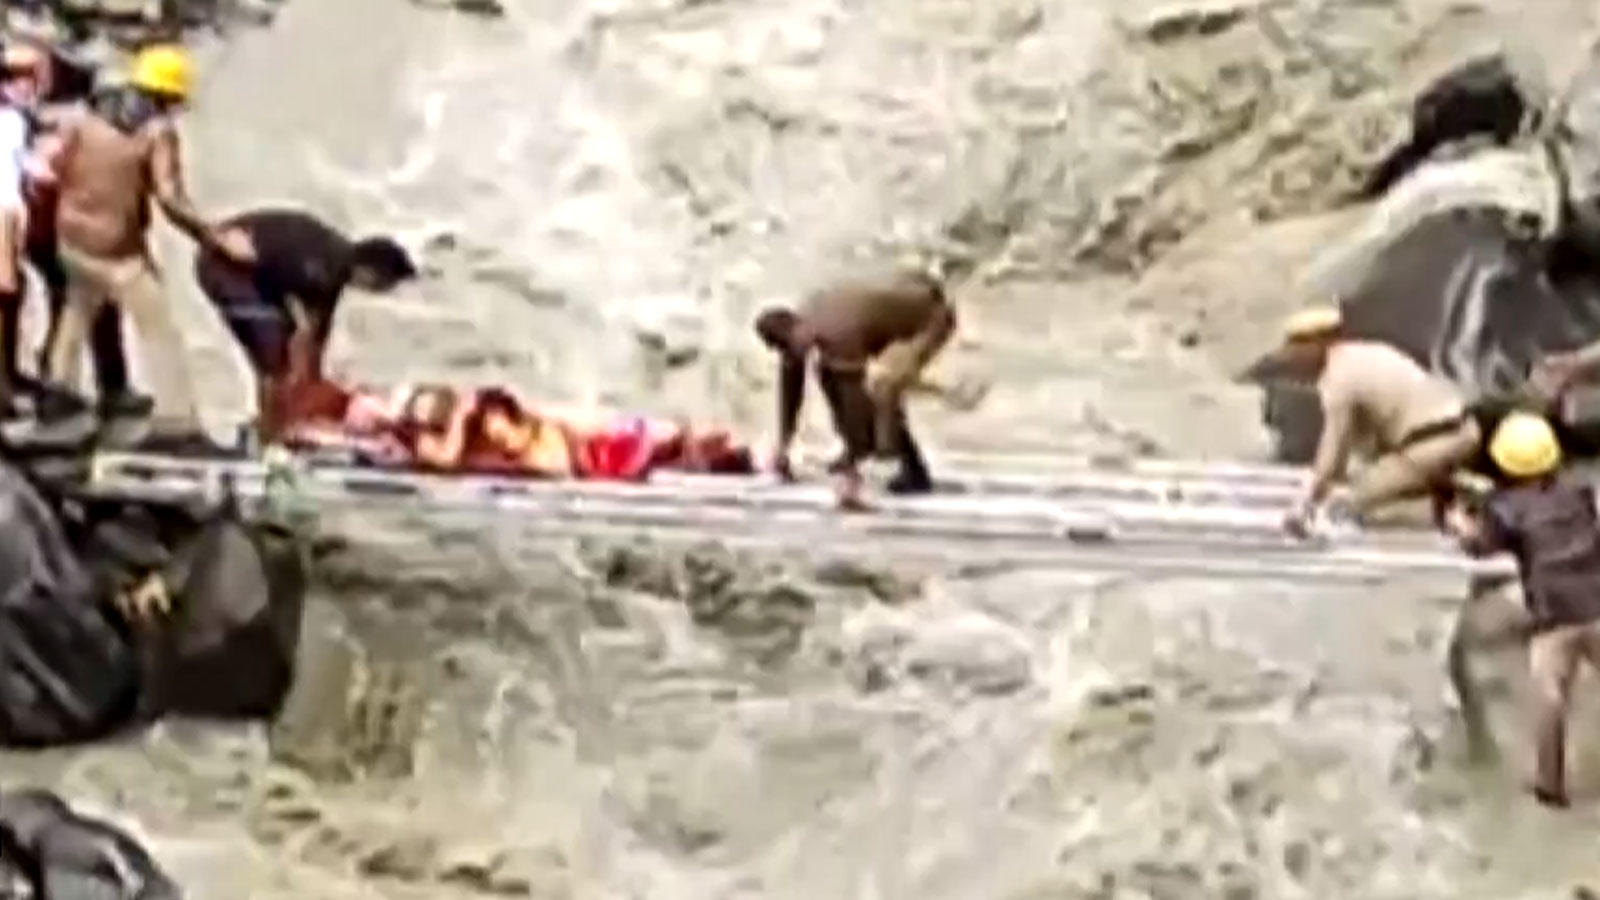 hp-rescue-team-carries-injured-person-across-raging-stream-using-ladders-as-bridge